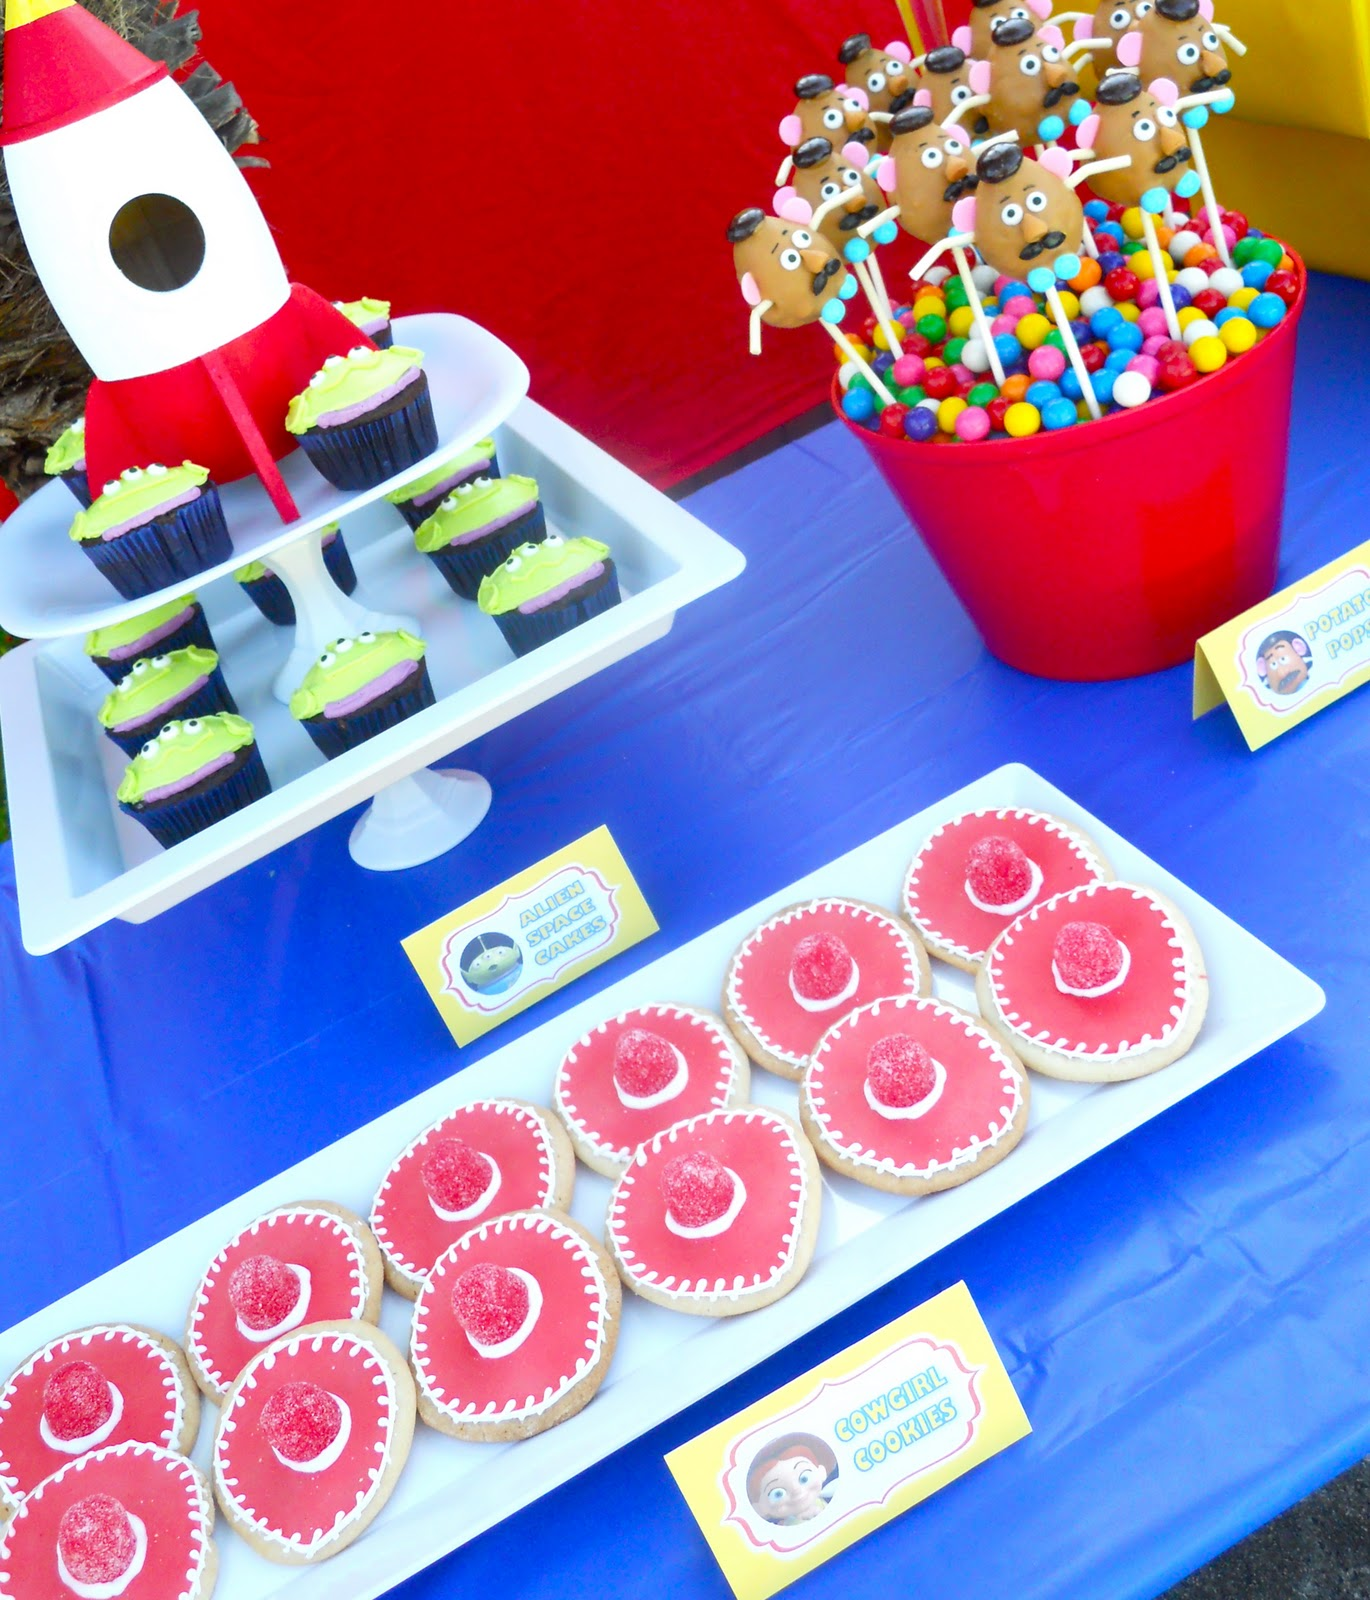 Toy Story Birthday Party : Oh sugar events toy story birthday